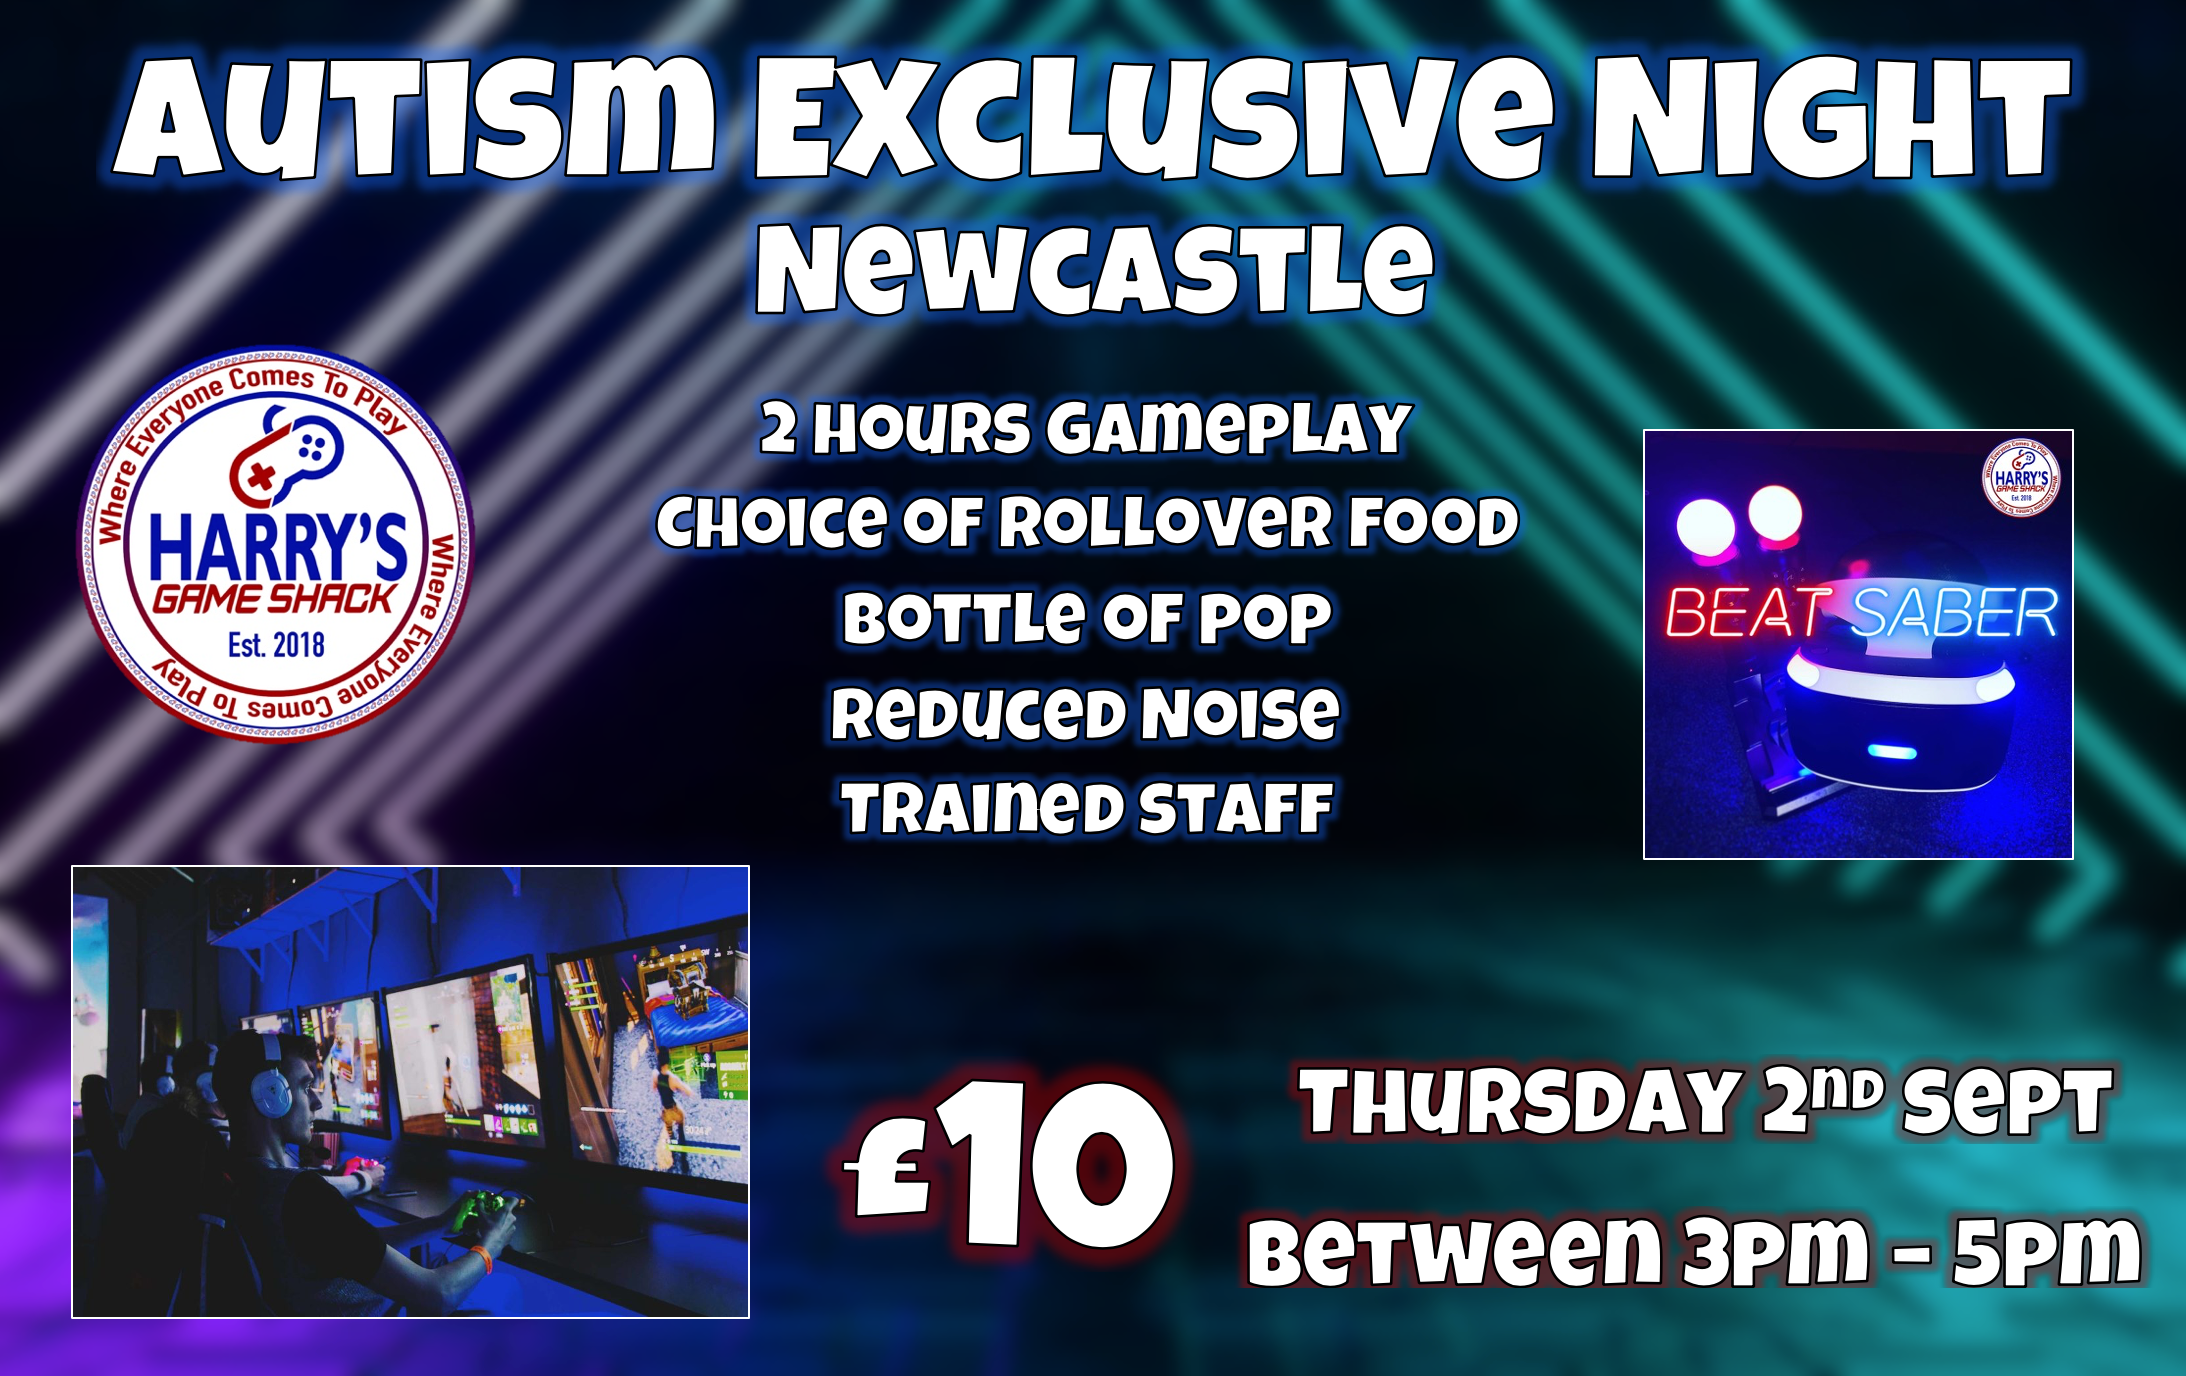 Autsim Exclusive Night Newcastle